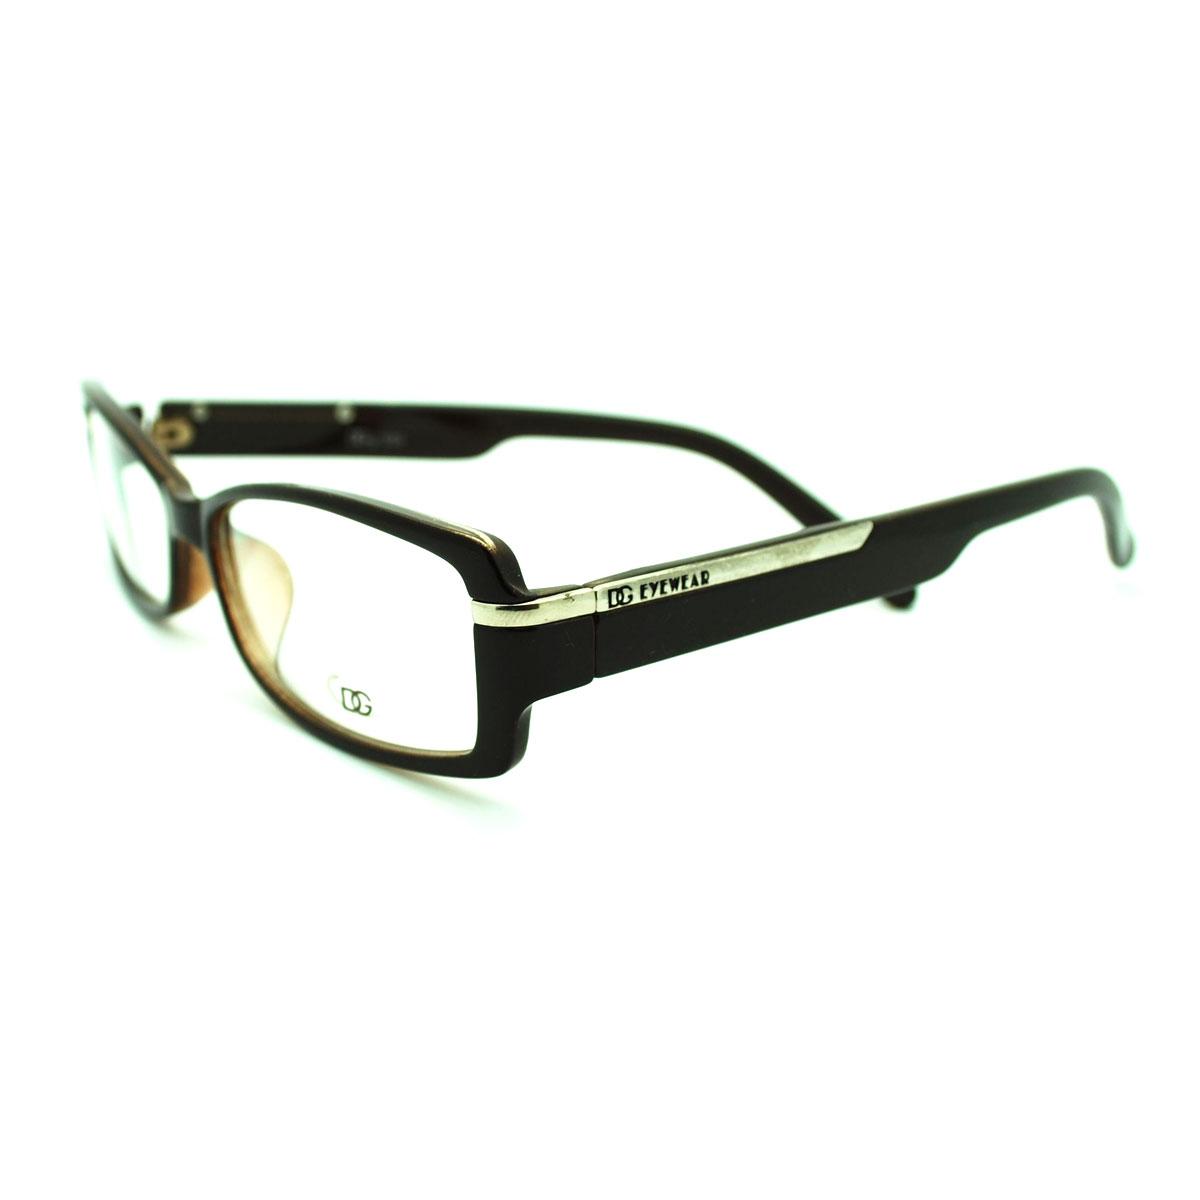 Glasses Narrow Frame : DG Eyewear School Girl Narrow Lens Rectangular Fashion Eye ...